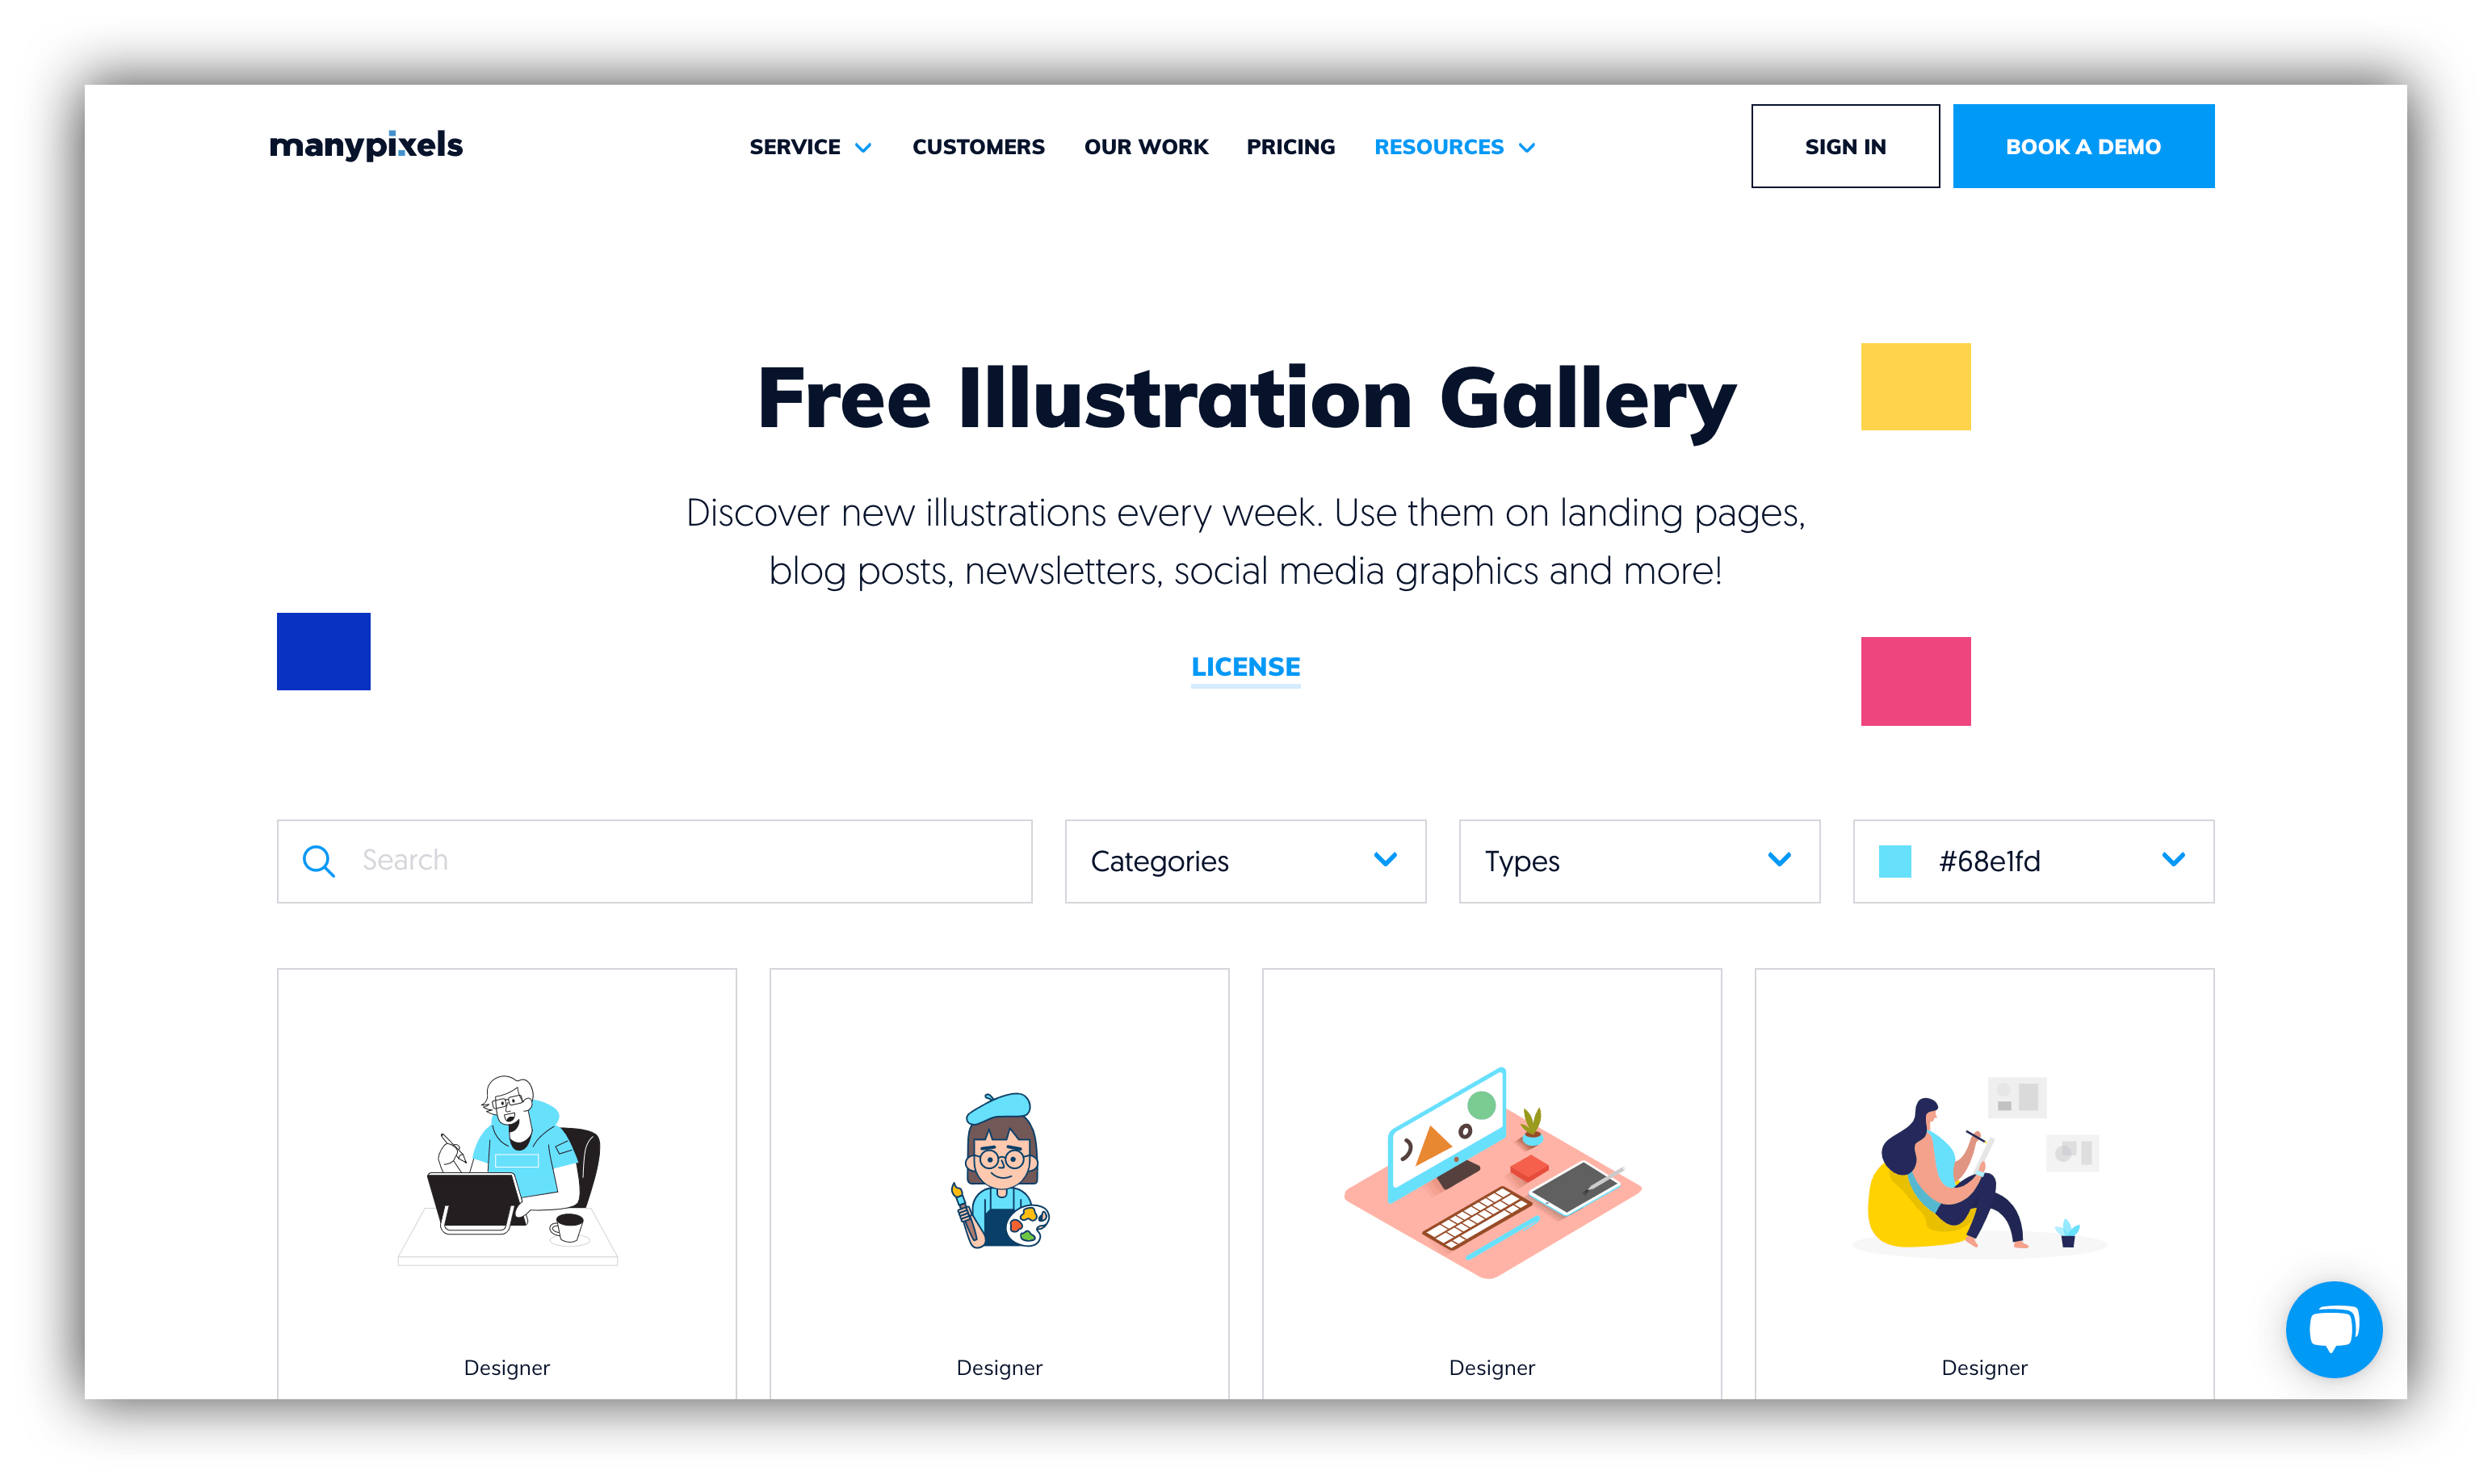 manypixels website